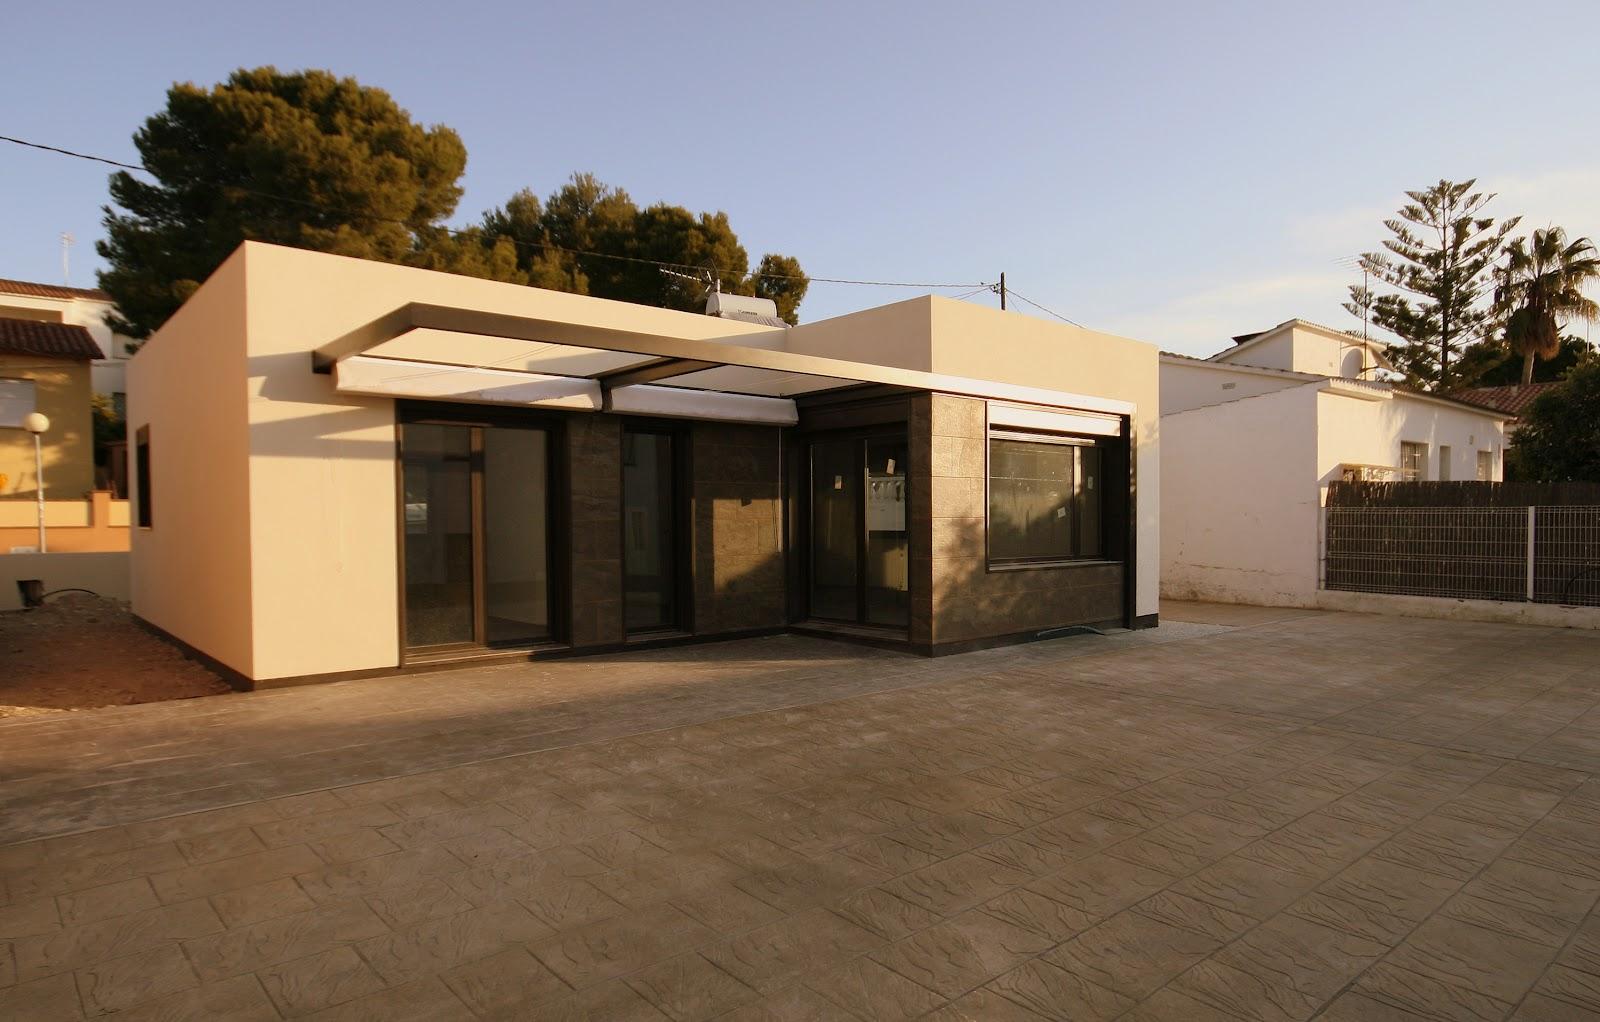 Casas modulares blochouse finalizadas las obras en - Casas modulares hormigon ...